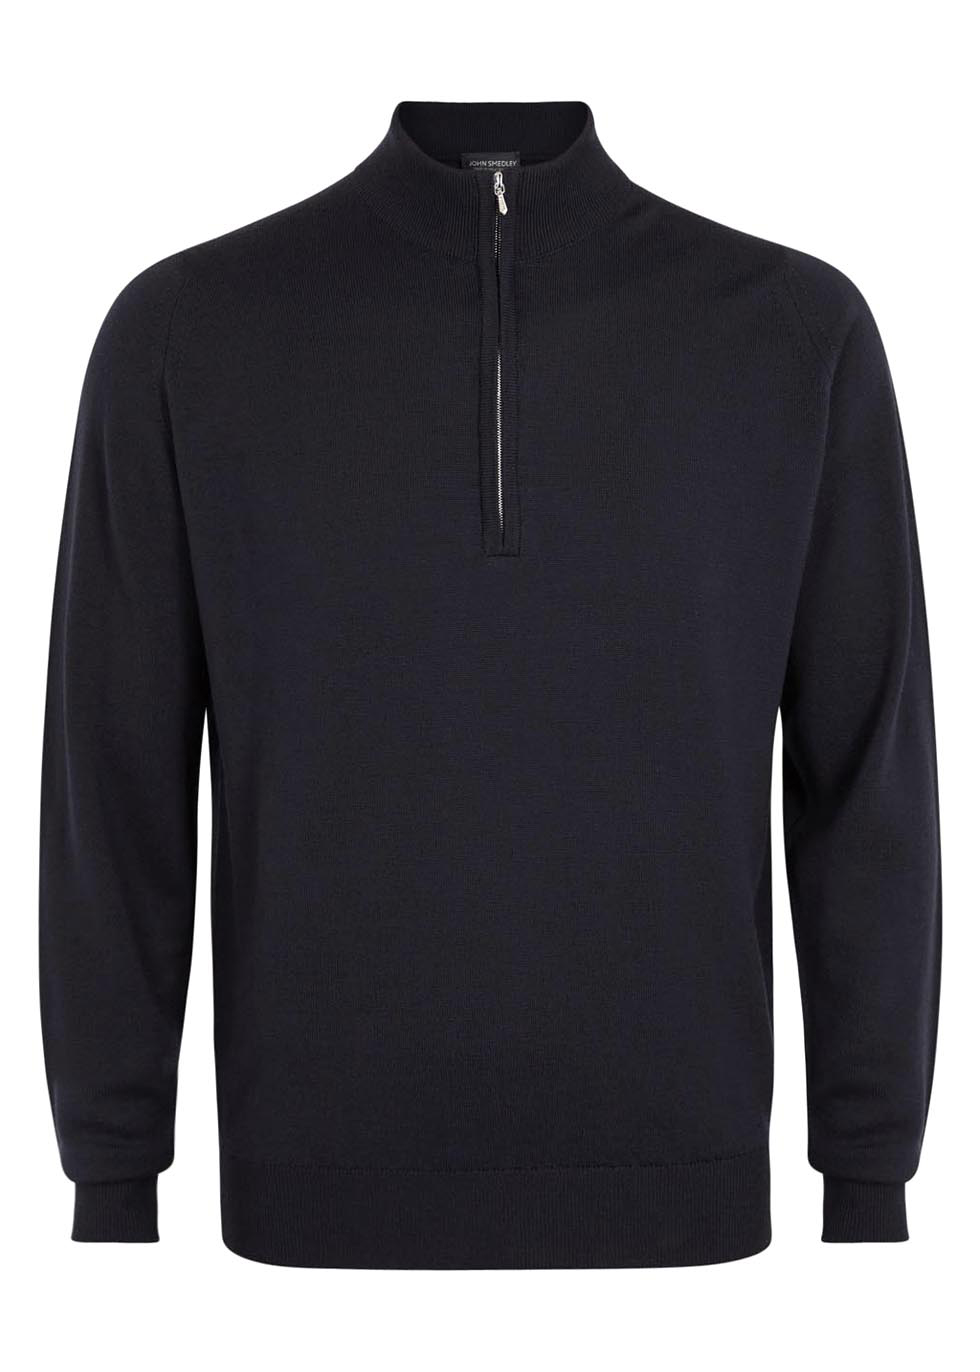 Wyvern navy merino wool jumper - John Smedley